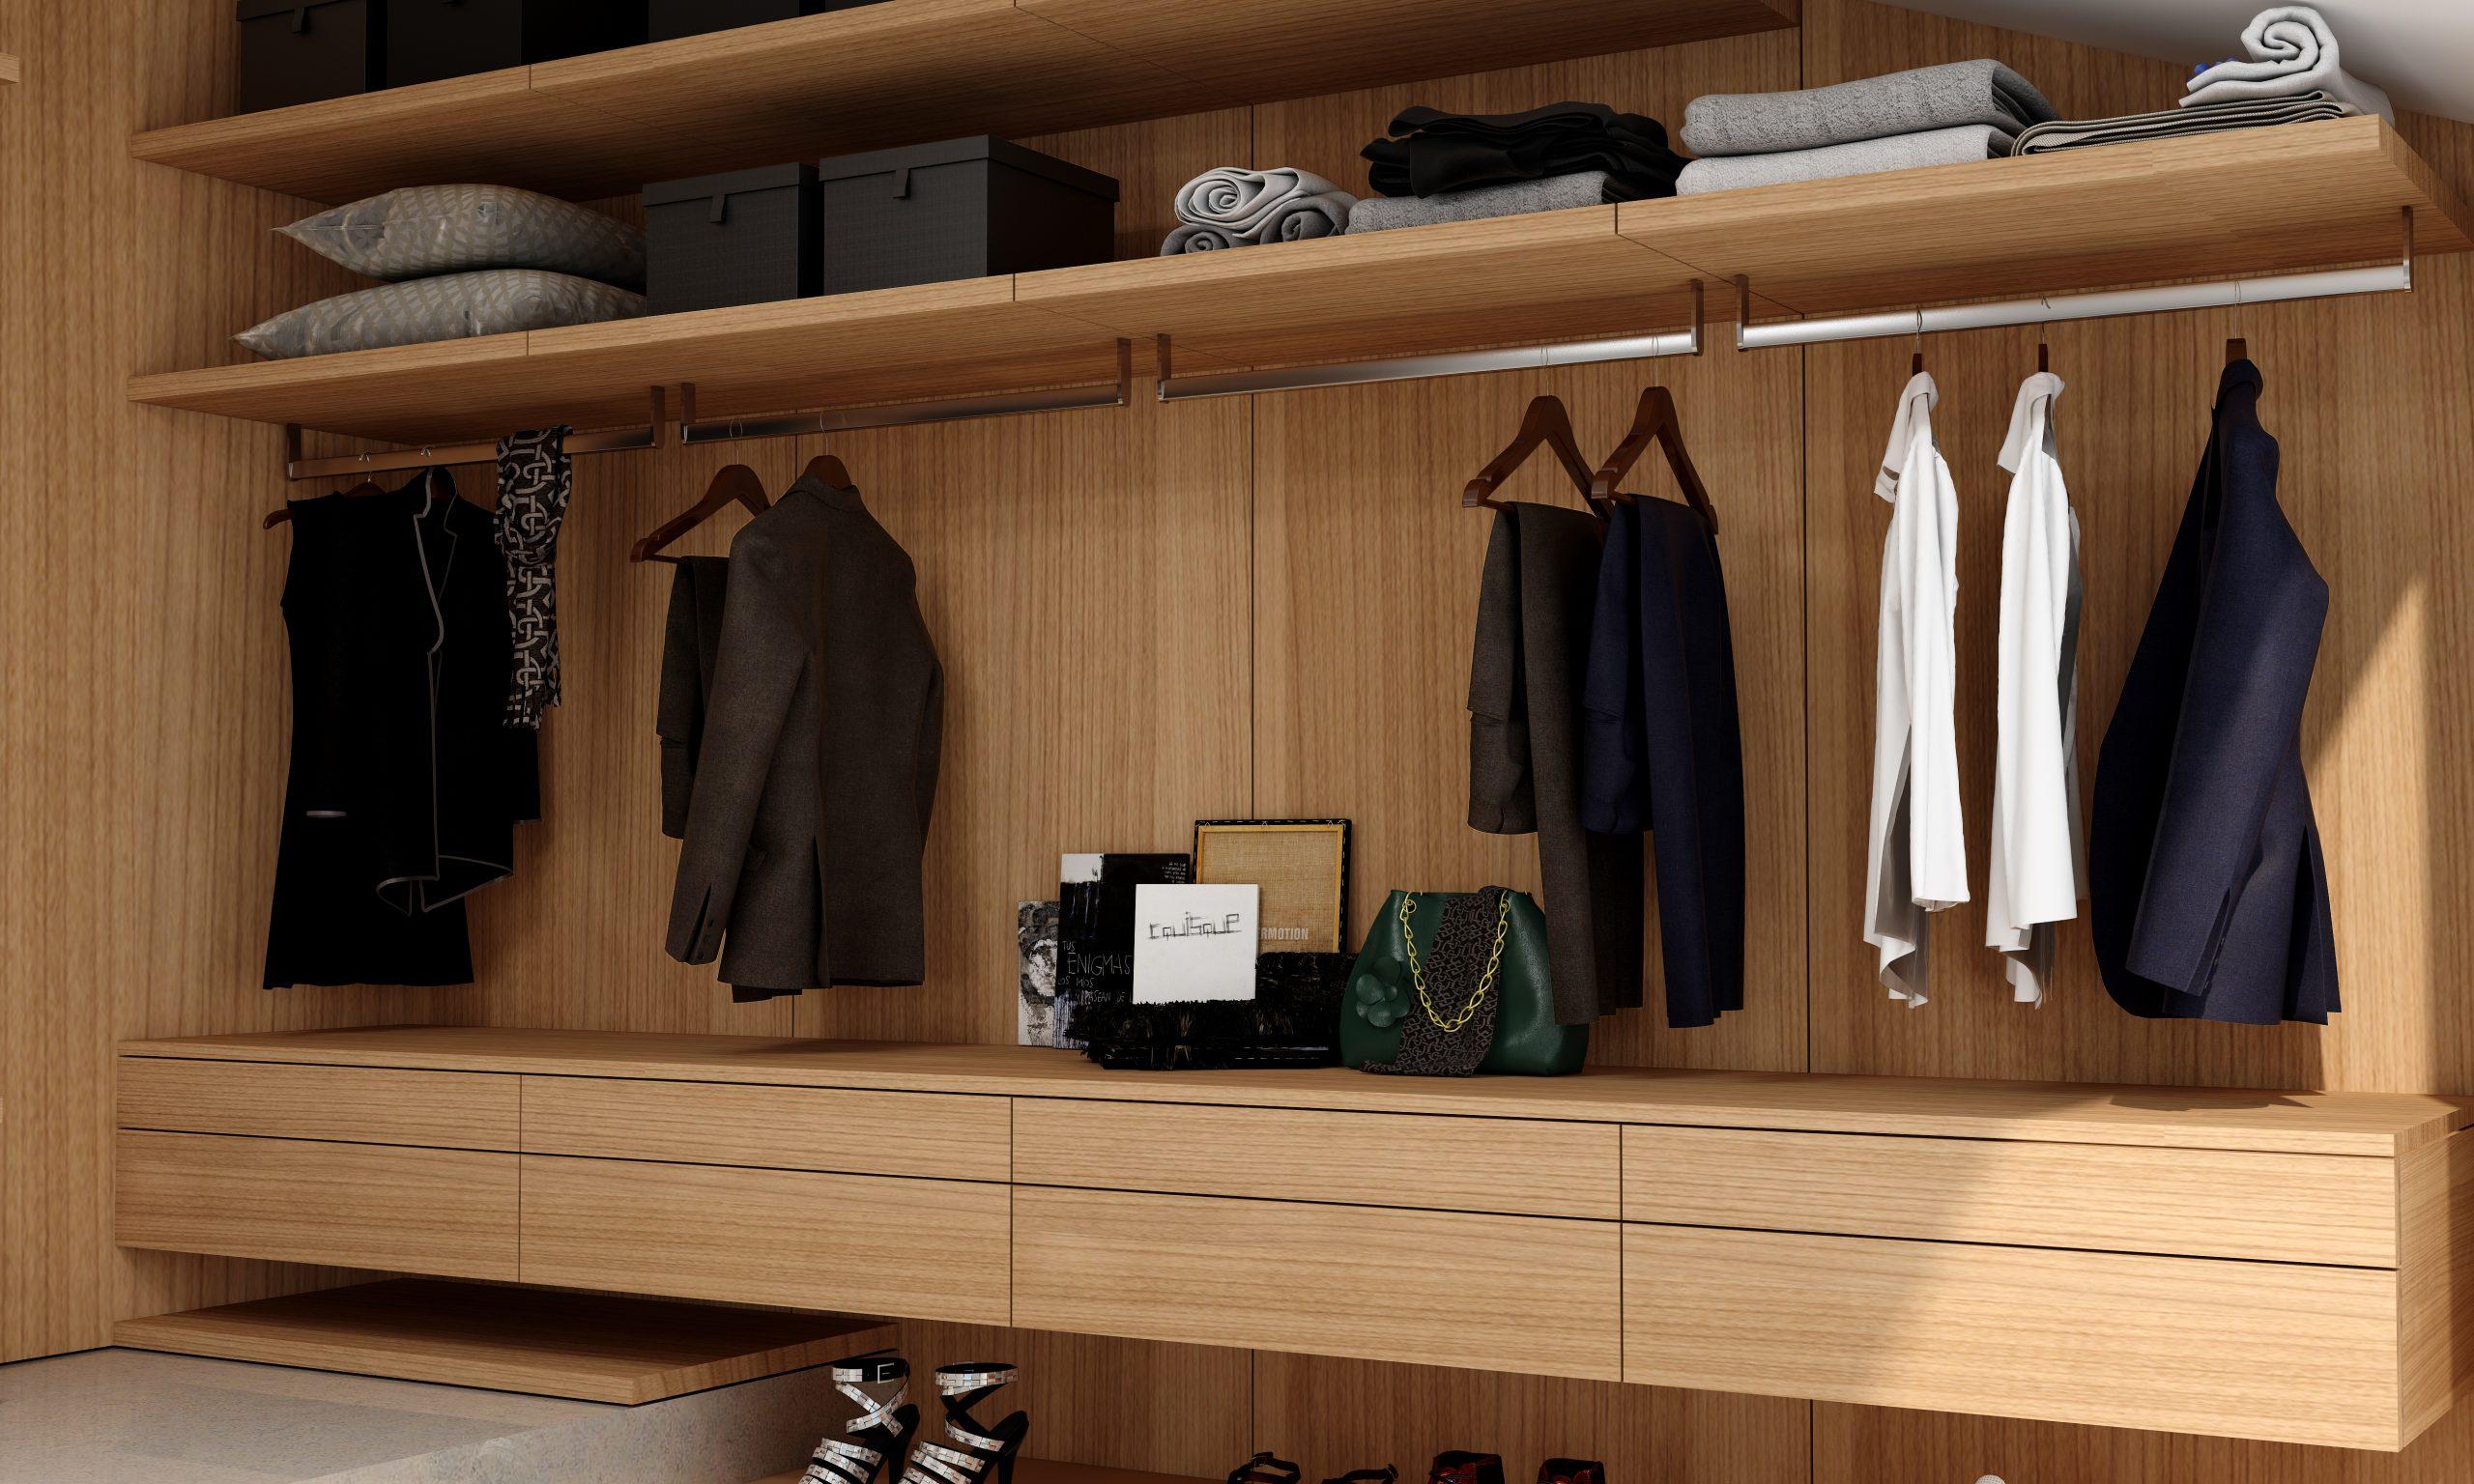 Luxury Walk-in Wardrobe in Woodgrain  Cherry Finish